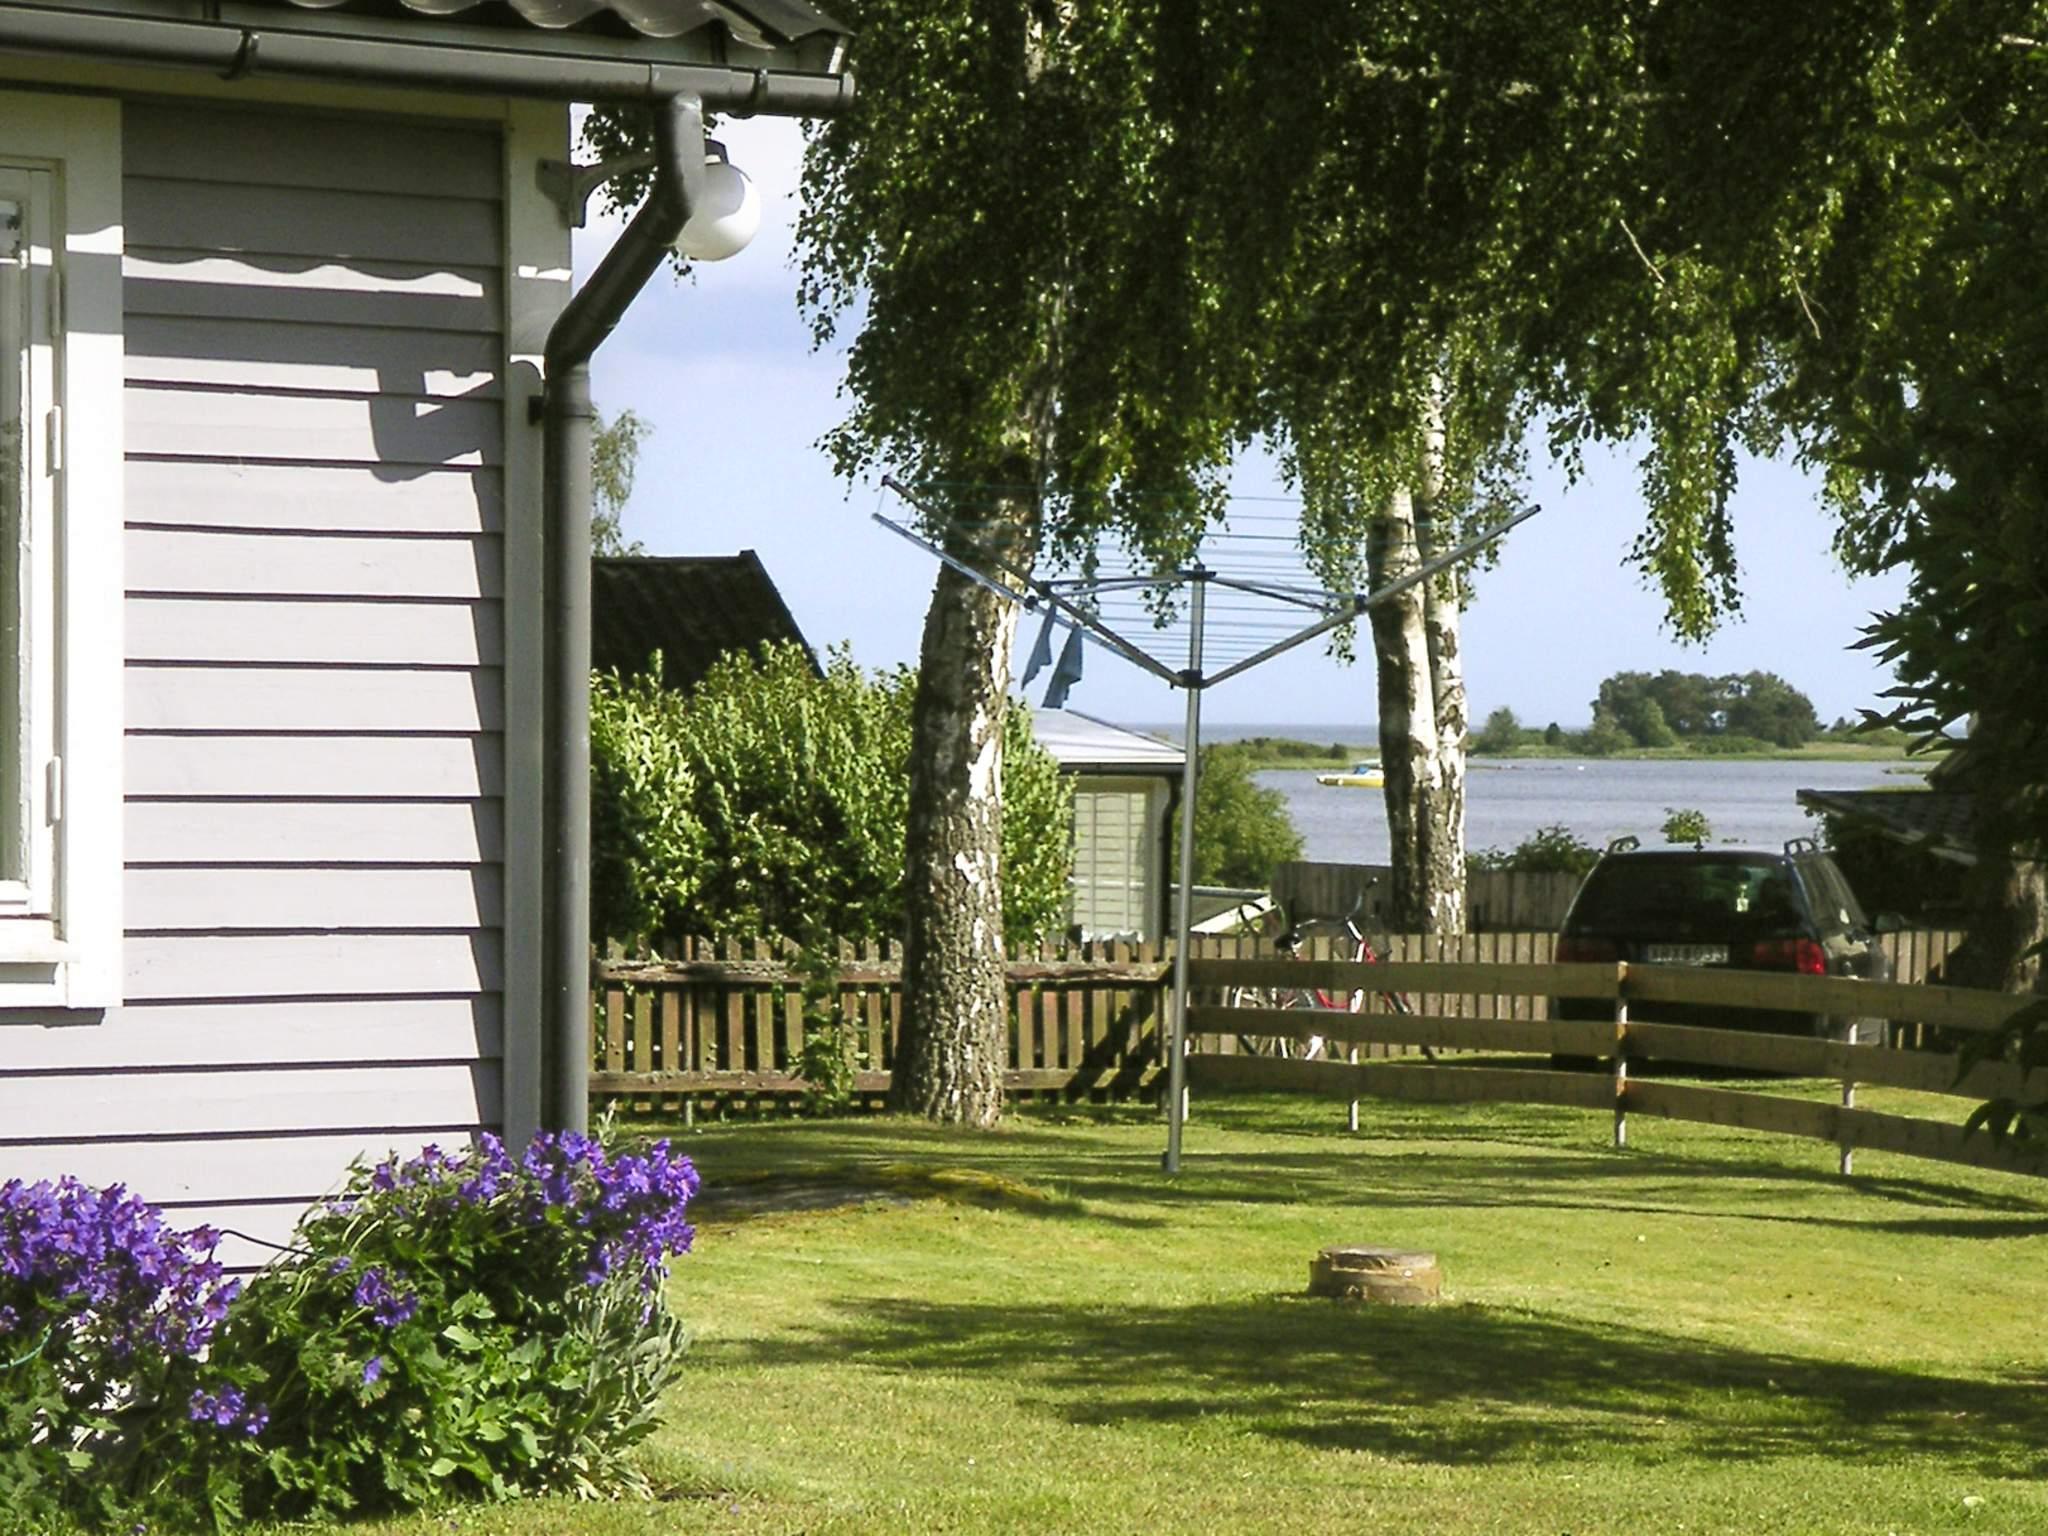 Ferienhaus Bergkvara (257129), Bergkvara, Kalmar län, Südschweden, Schweden, Bild 1